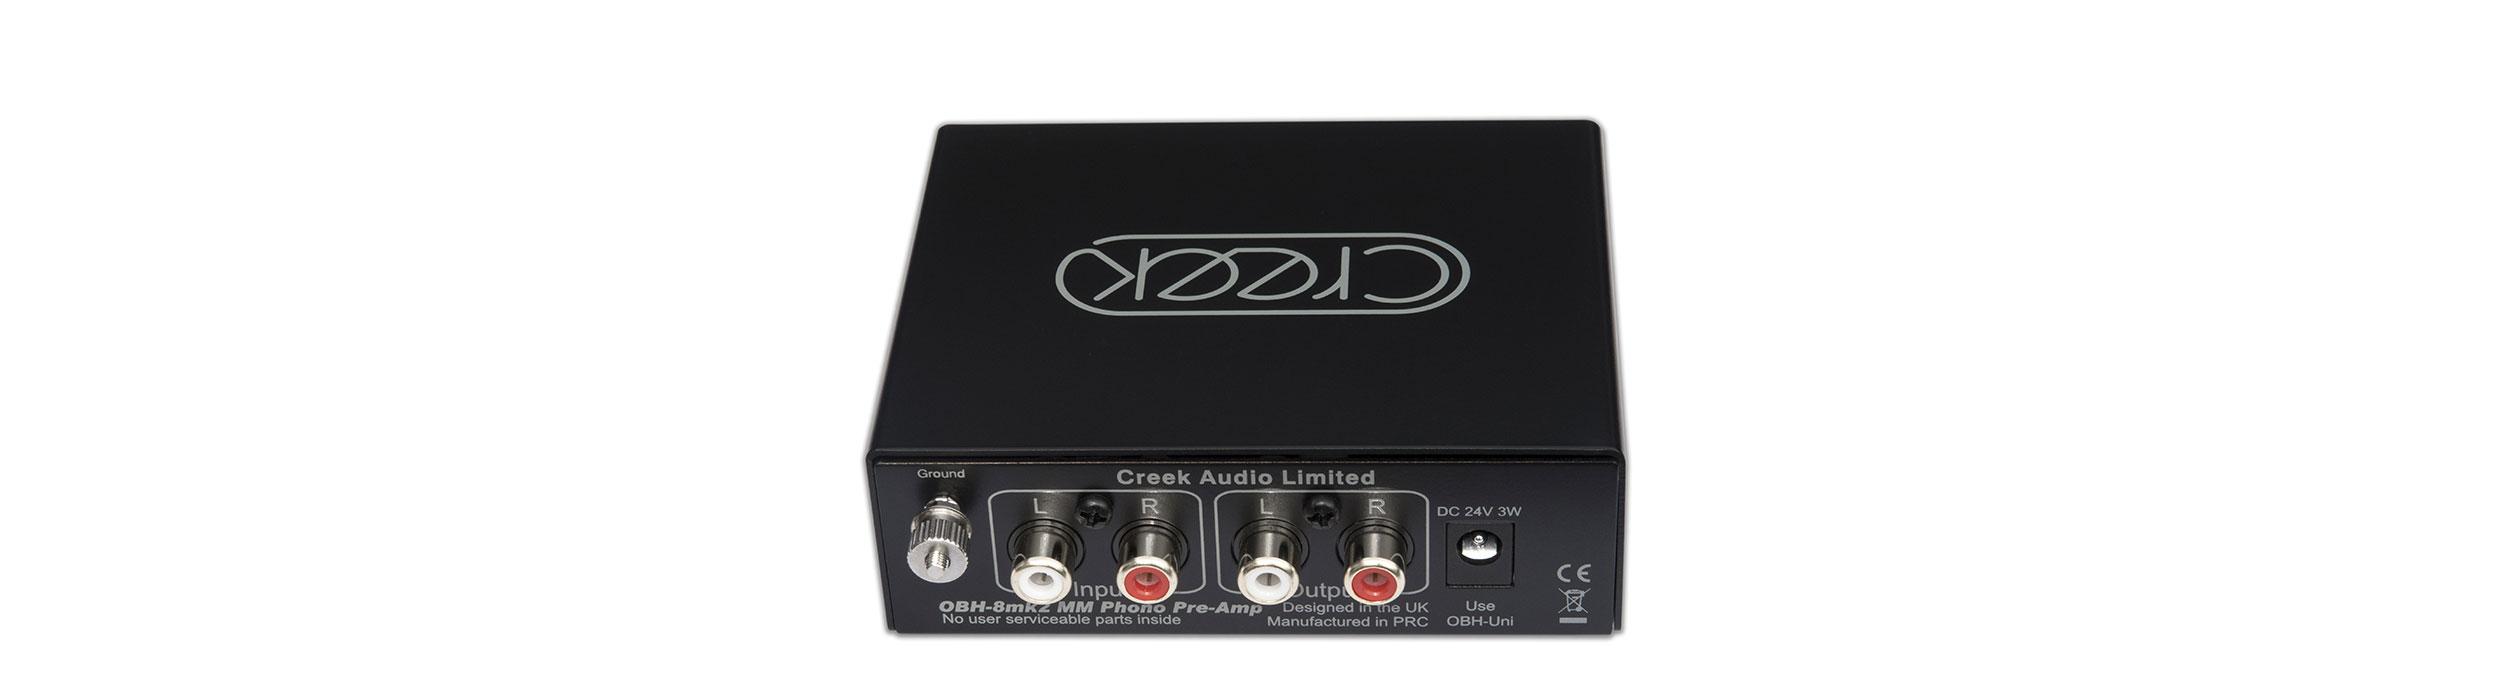 Creek Audio - OBH-8mk2 Phono Stage Rear